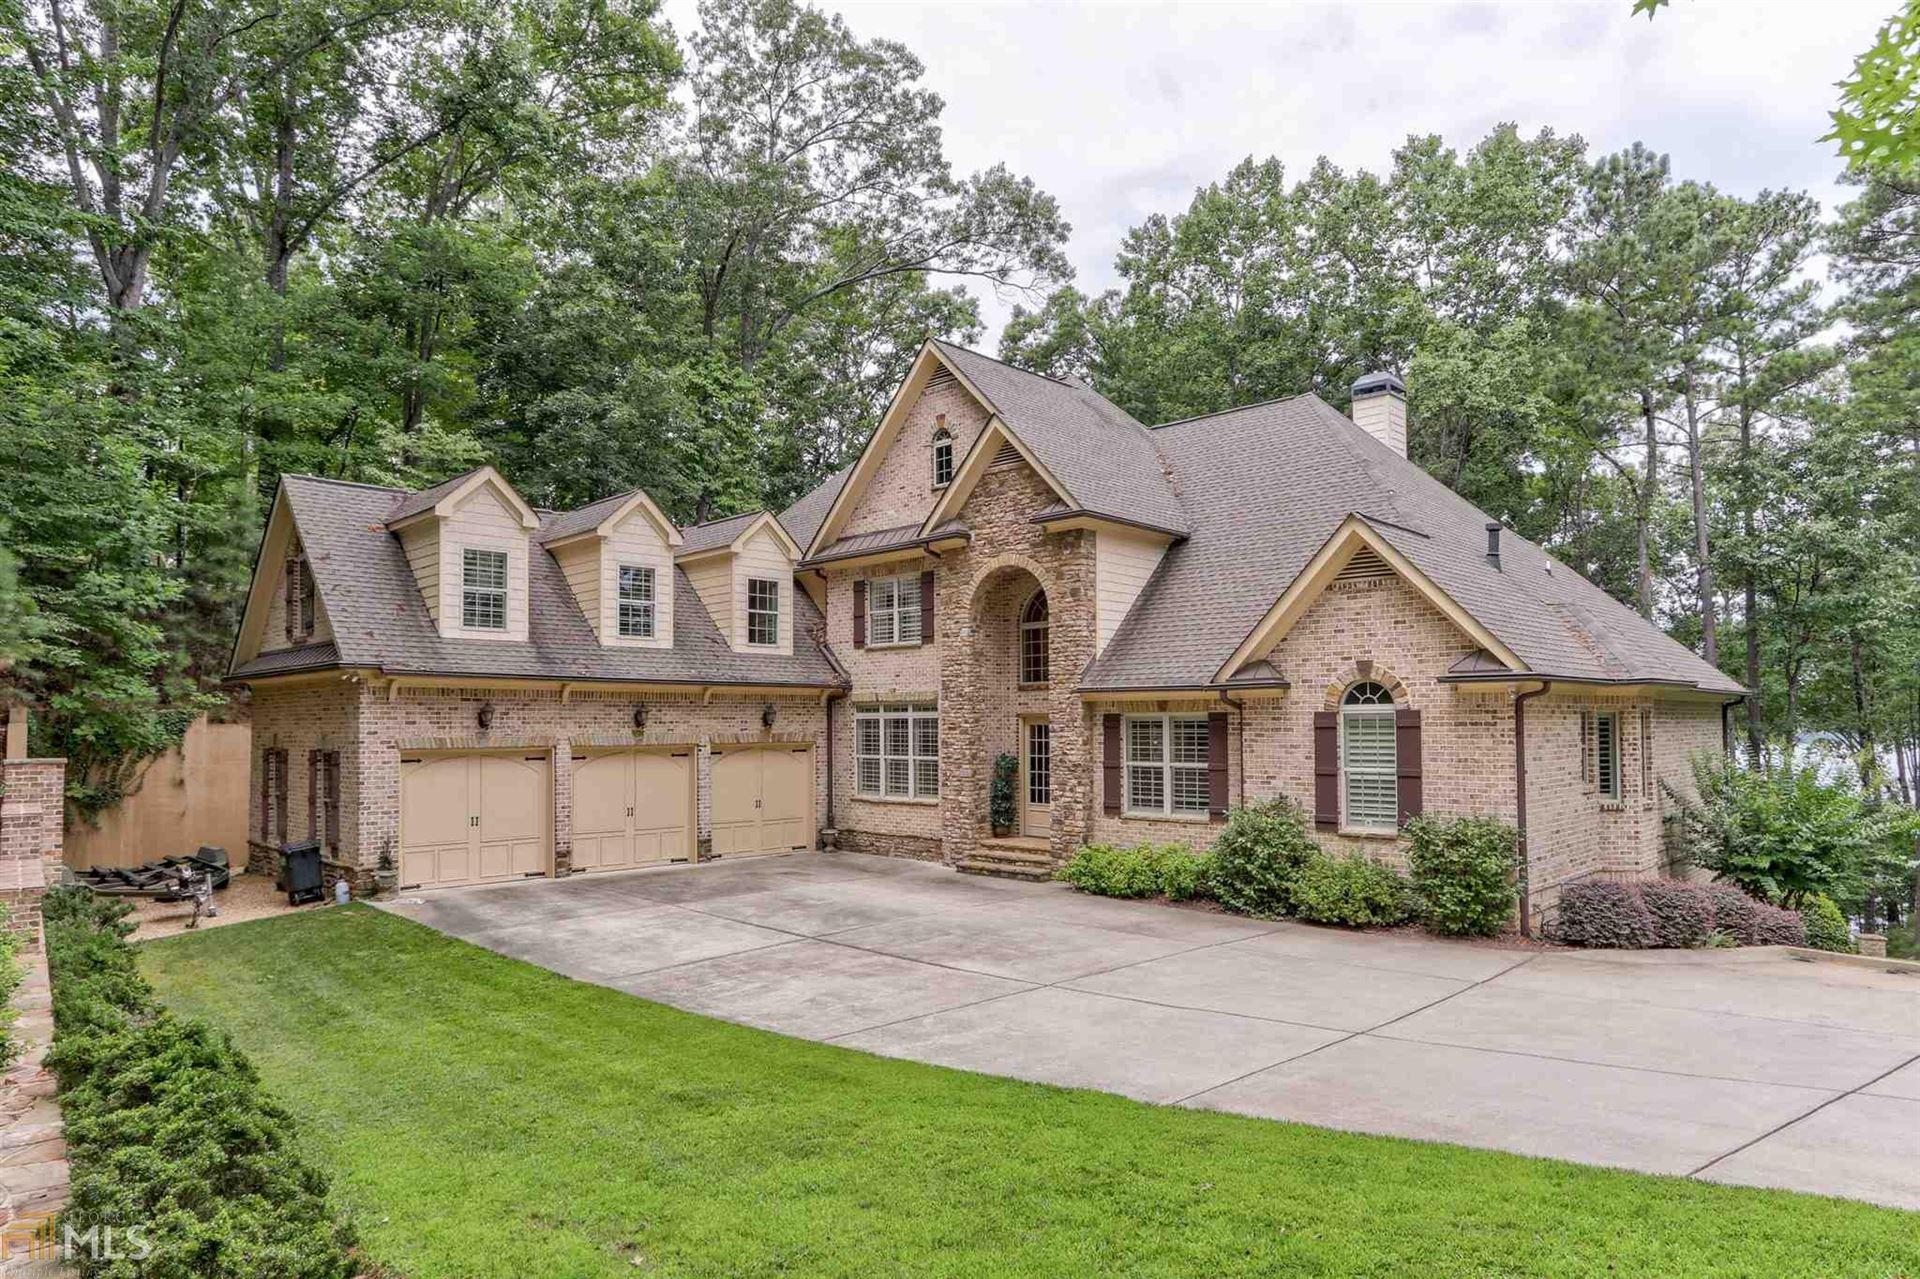 5483 Key Pt, Gainesville, GA 30504 - MLS#: 8874142